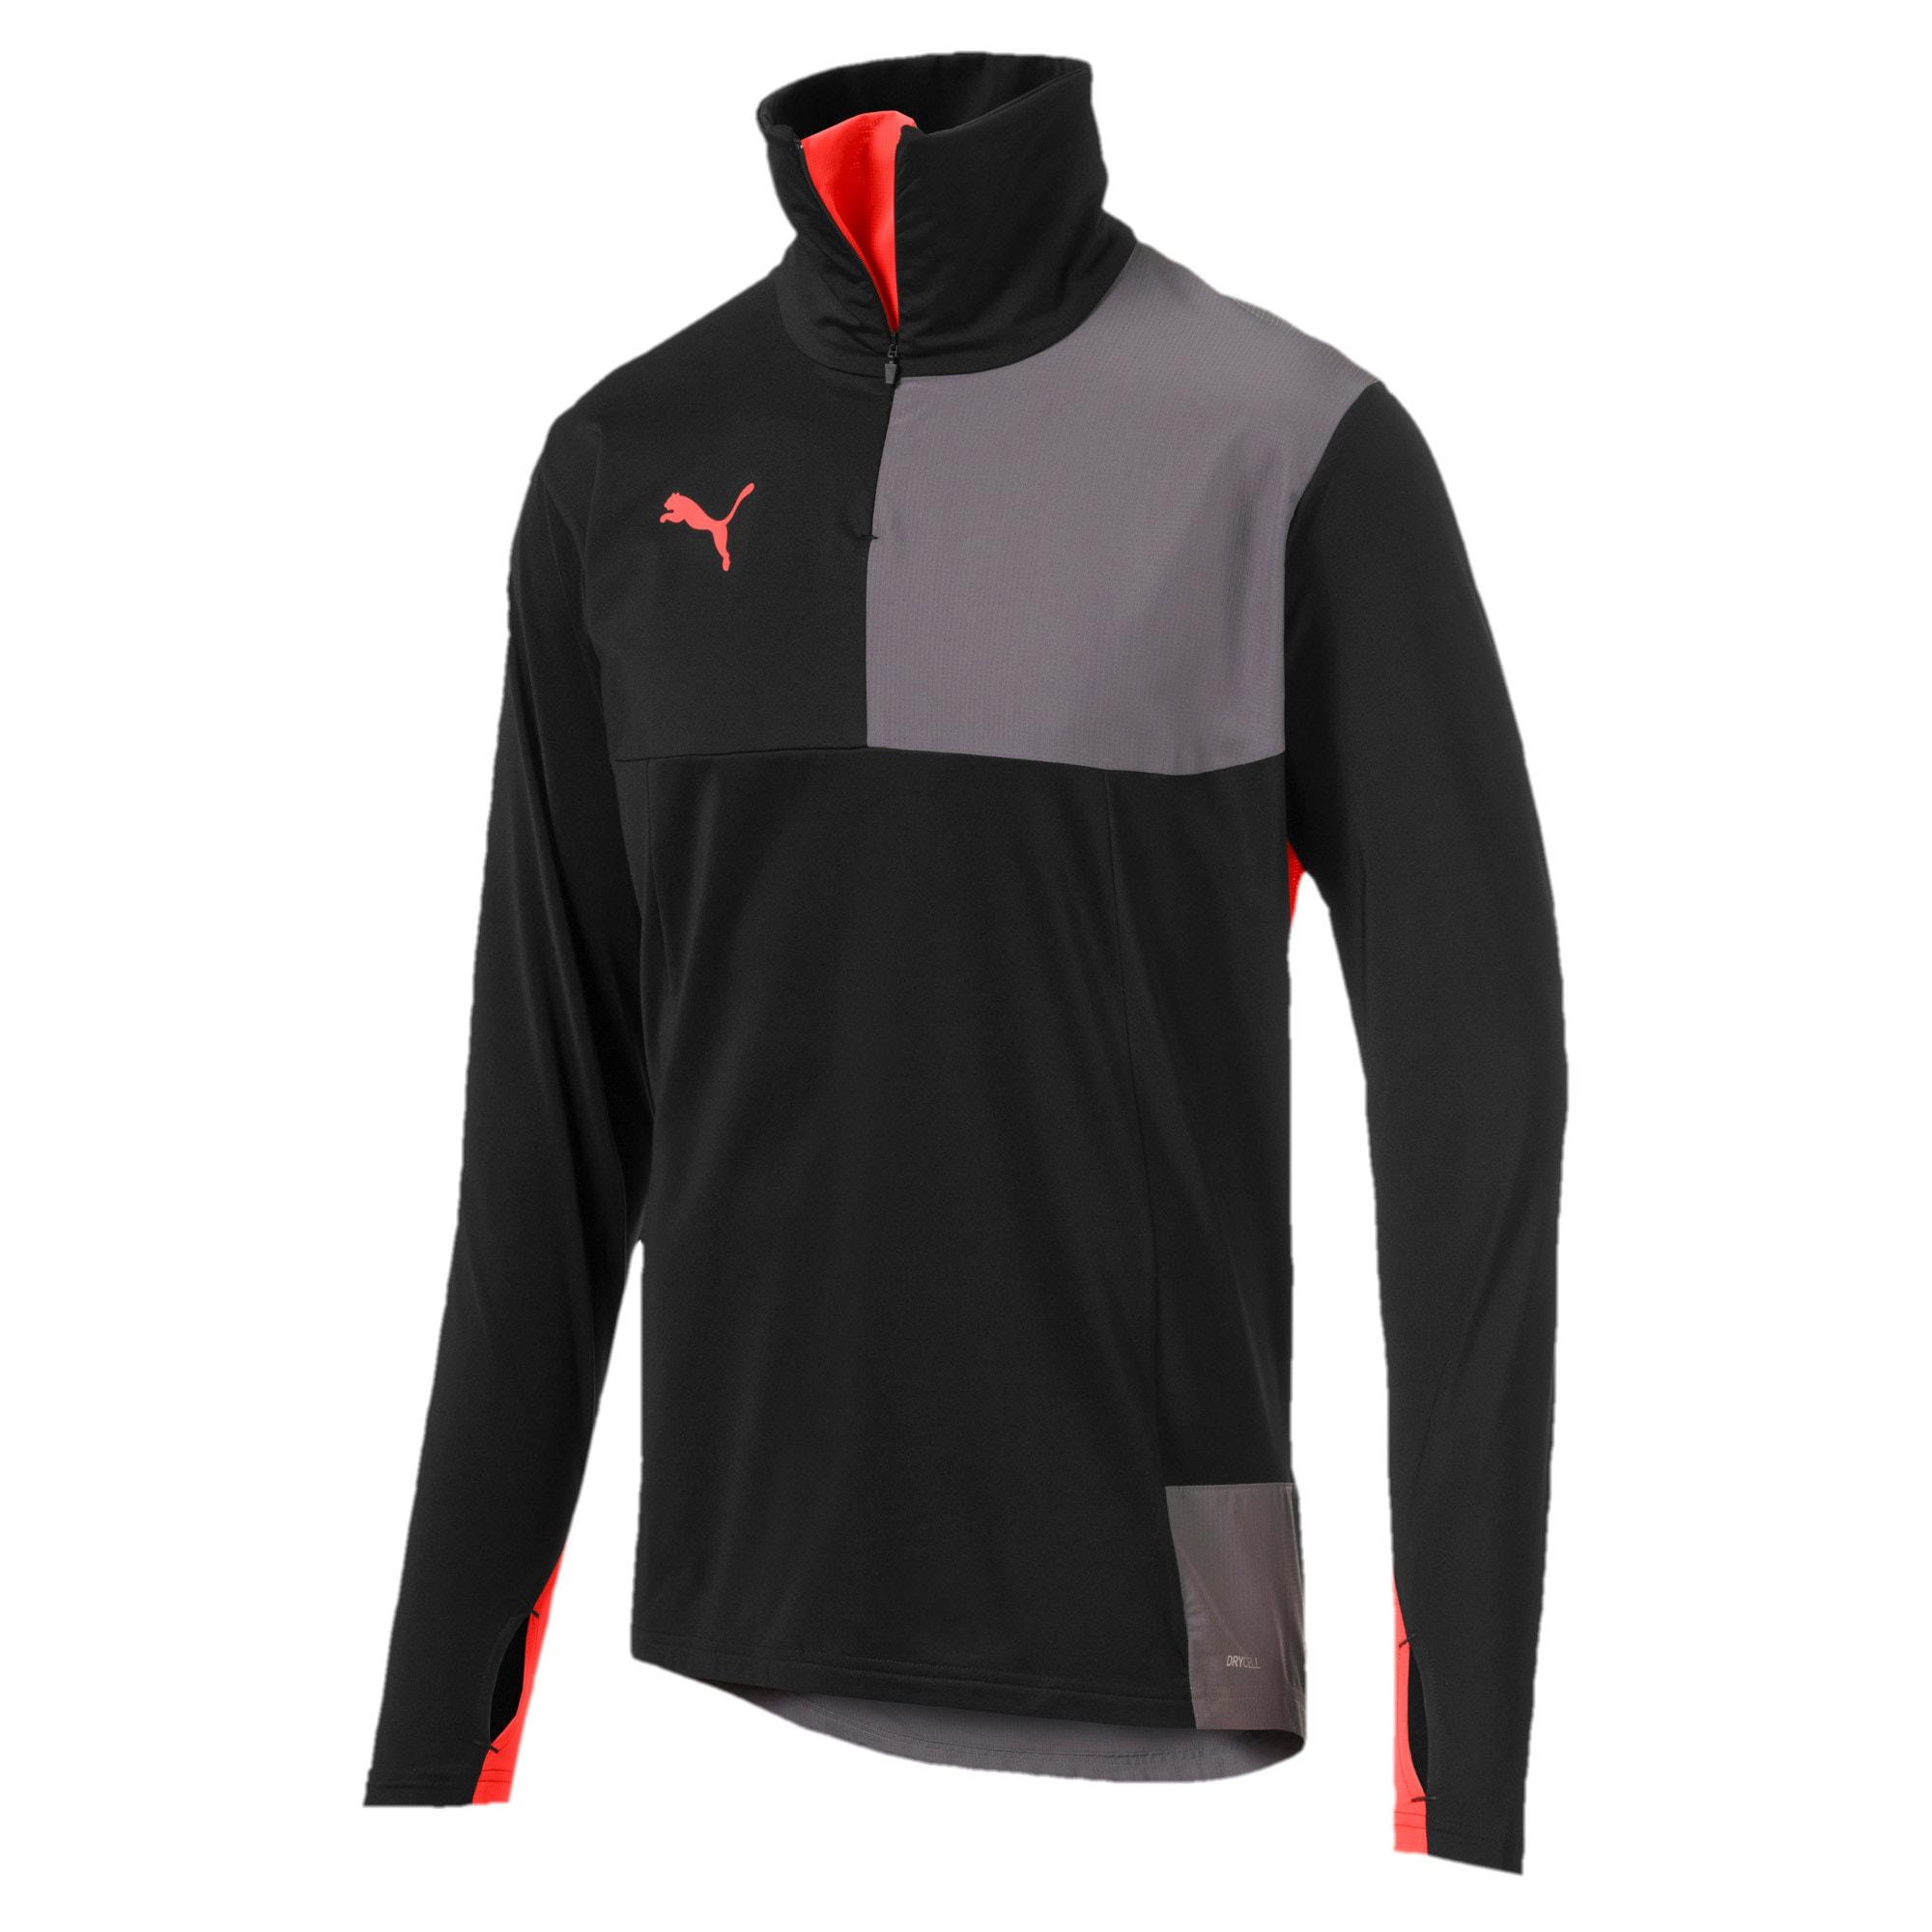 Thumbnail 4 of ftblNXT Quarter Zip Men's Top, Puma Black-Nrgy Red, medium